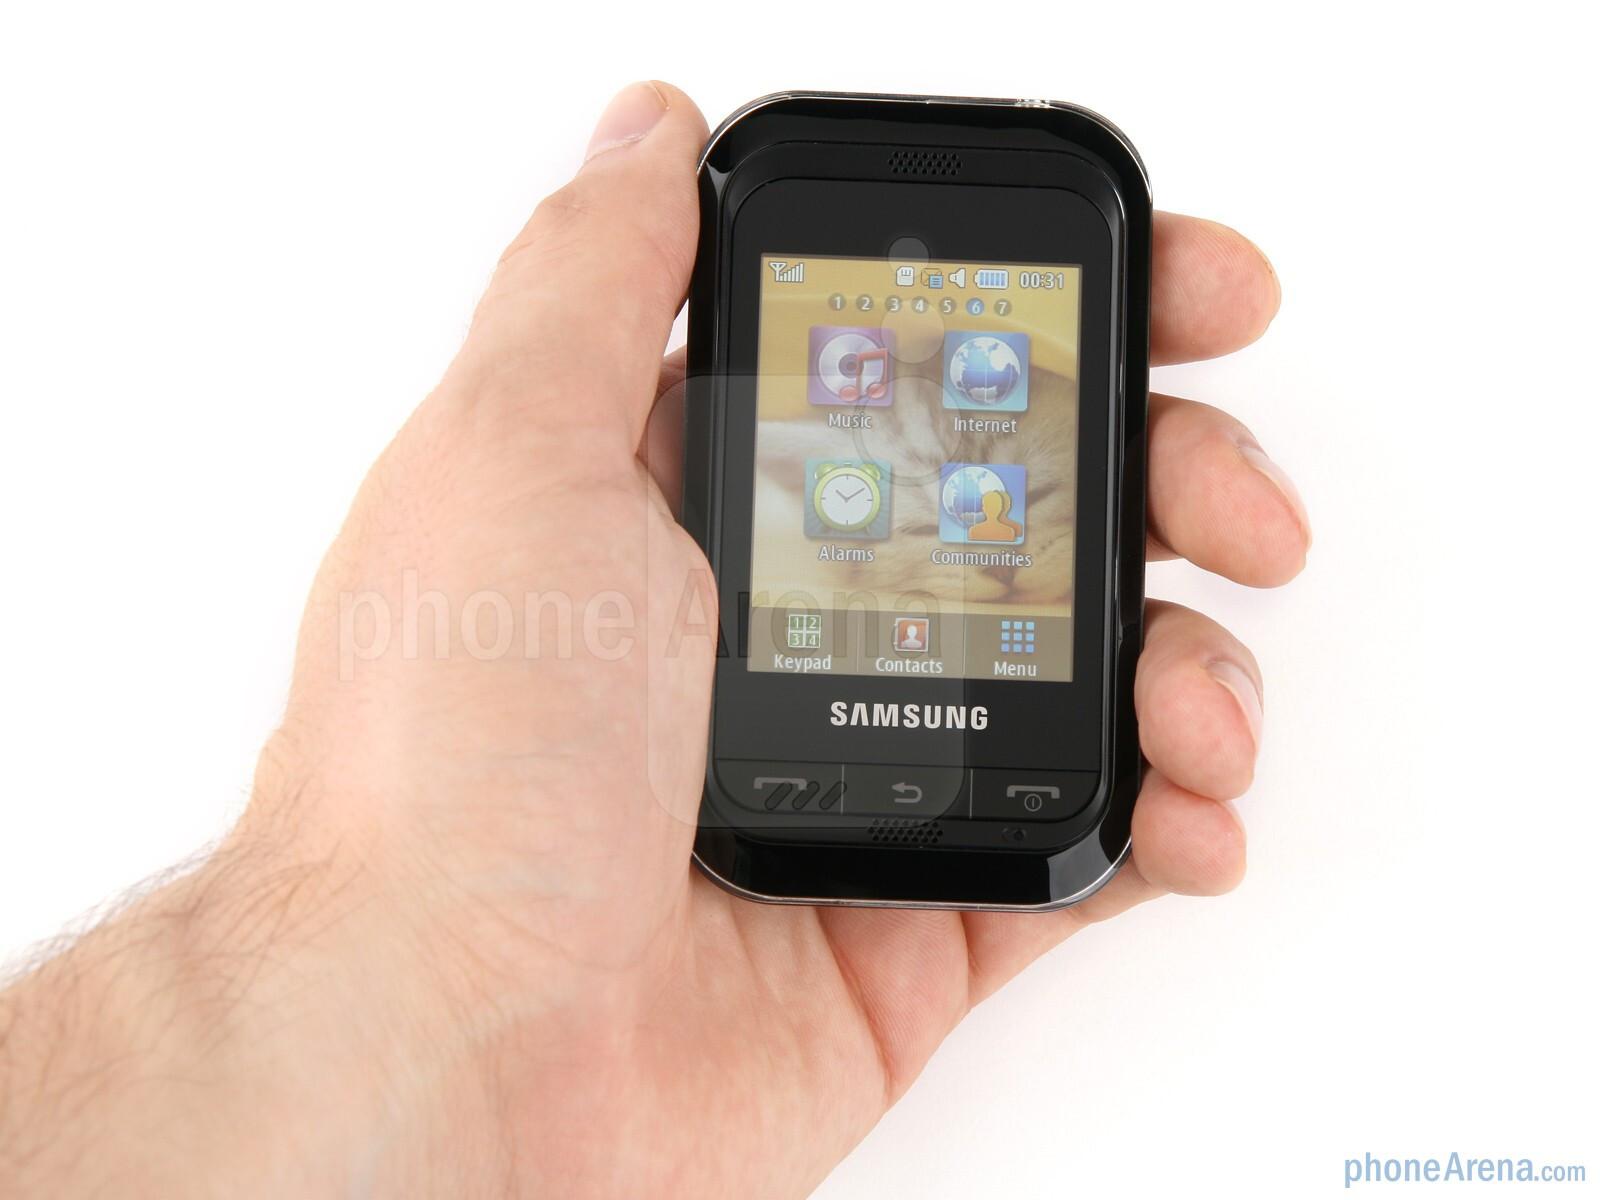 samsung champ review rh phonearena com Samsung Refrigerator Repair Manual Samsung User Manual Guide